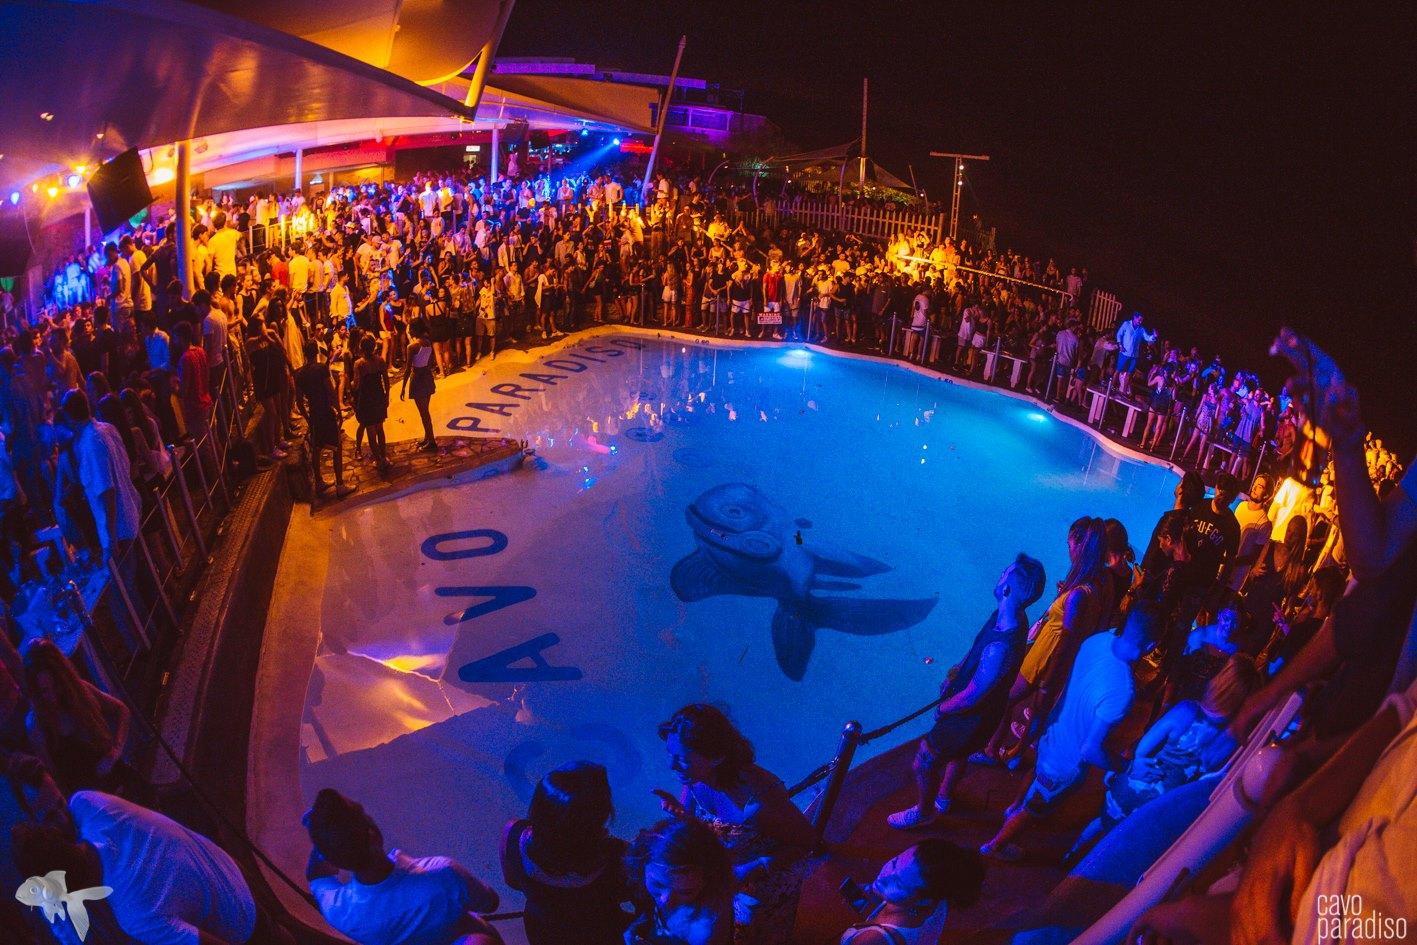 Cavo Paradiso's iconic pool